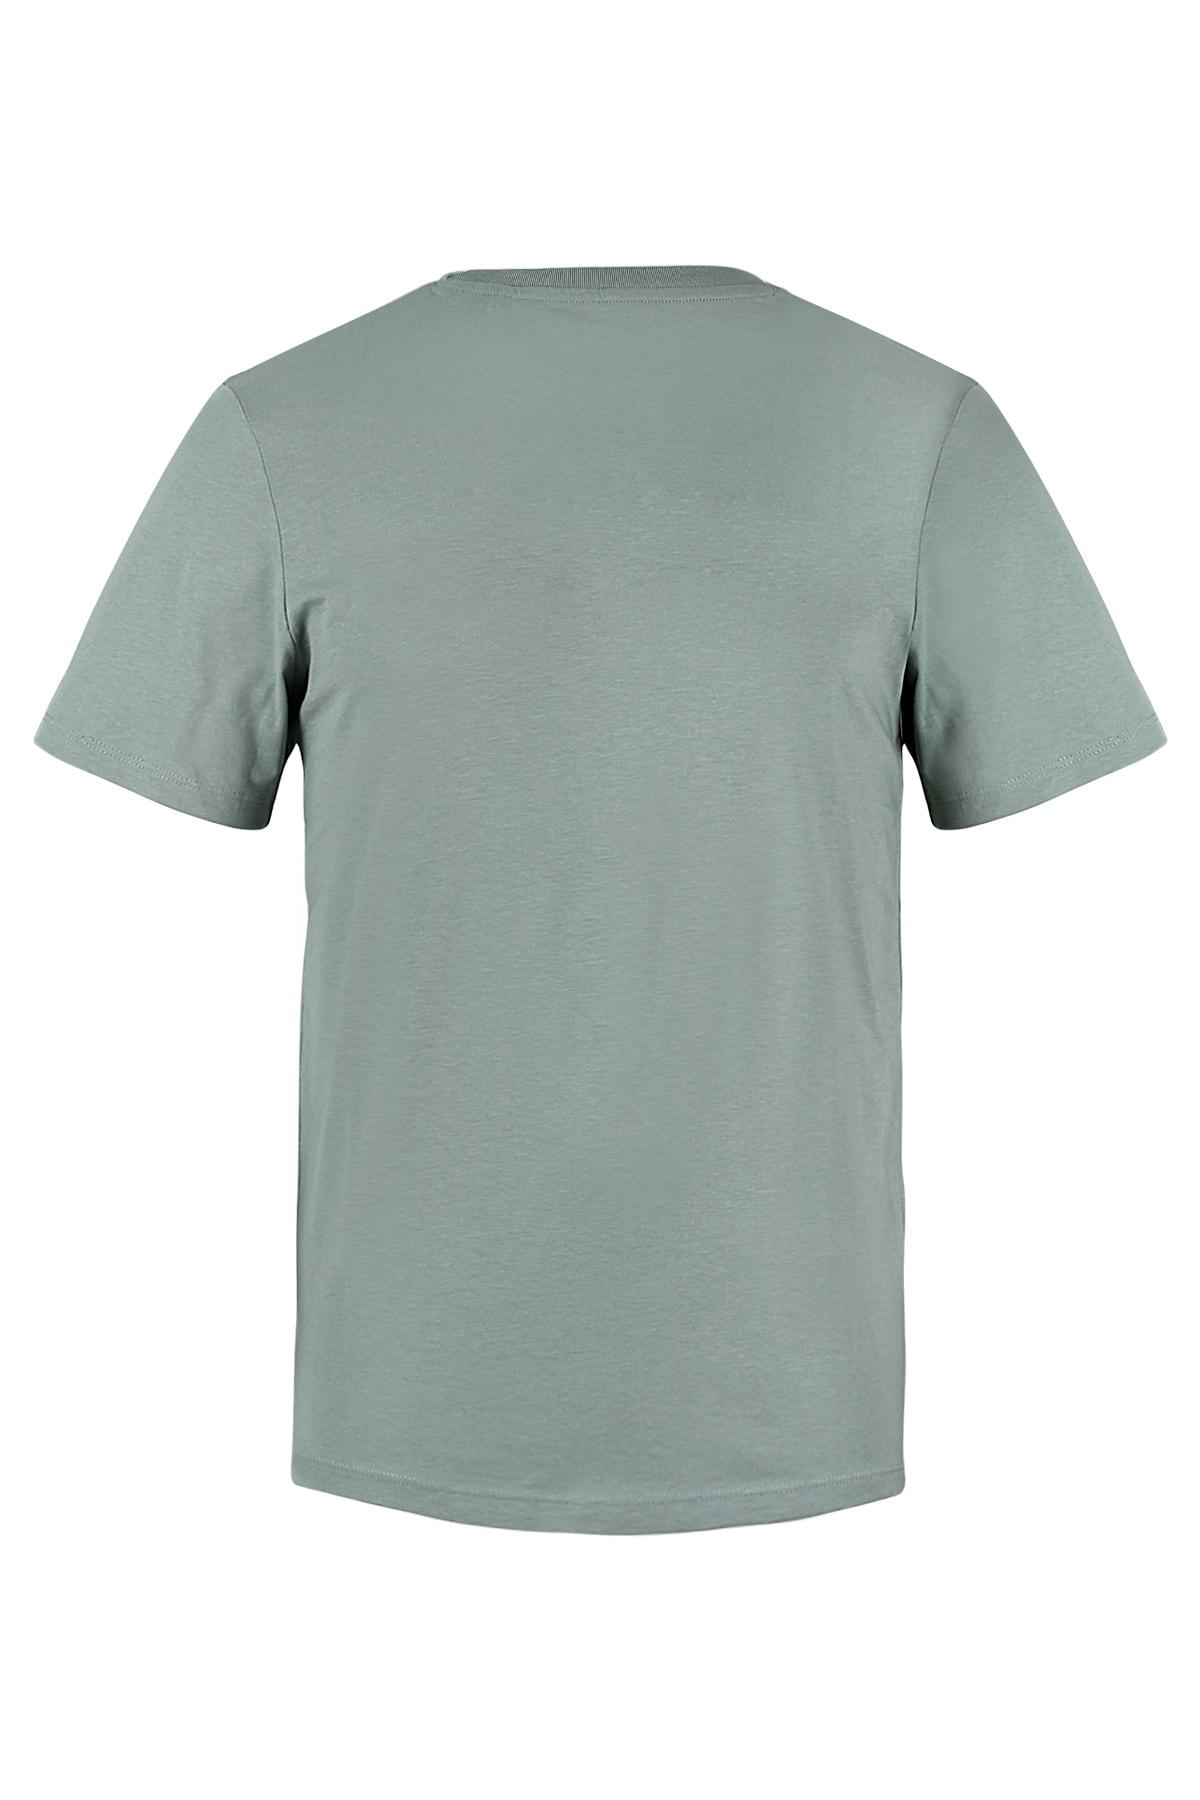 Jack & Jones Bisiklet Yaka T-shirt 12137126 Jjecorp 2